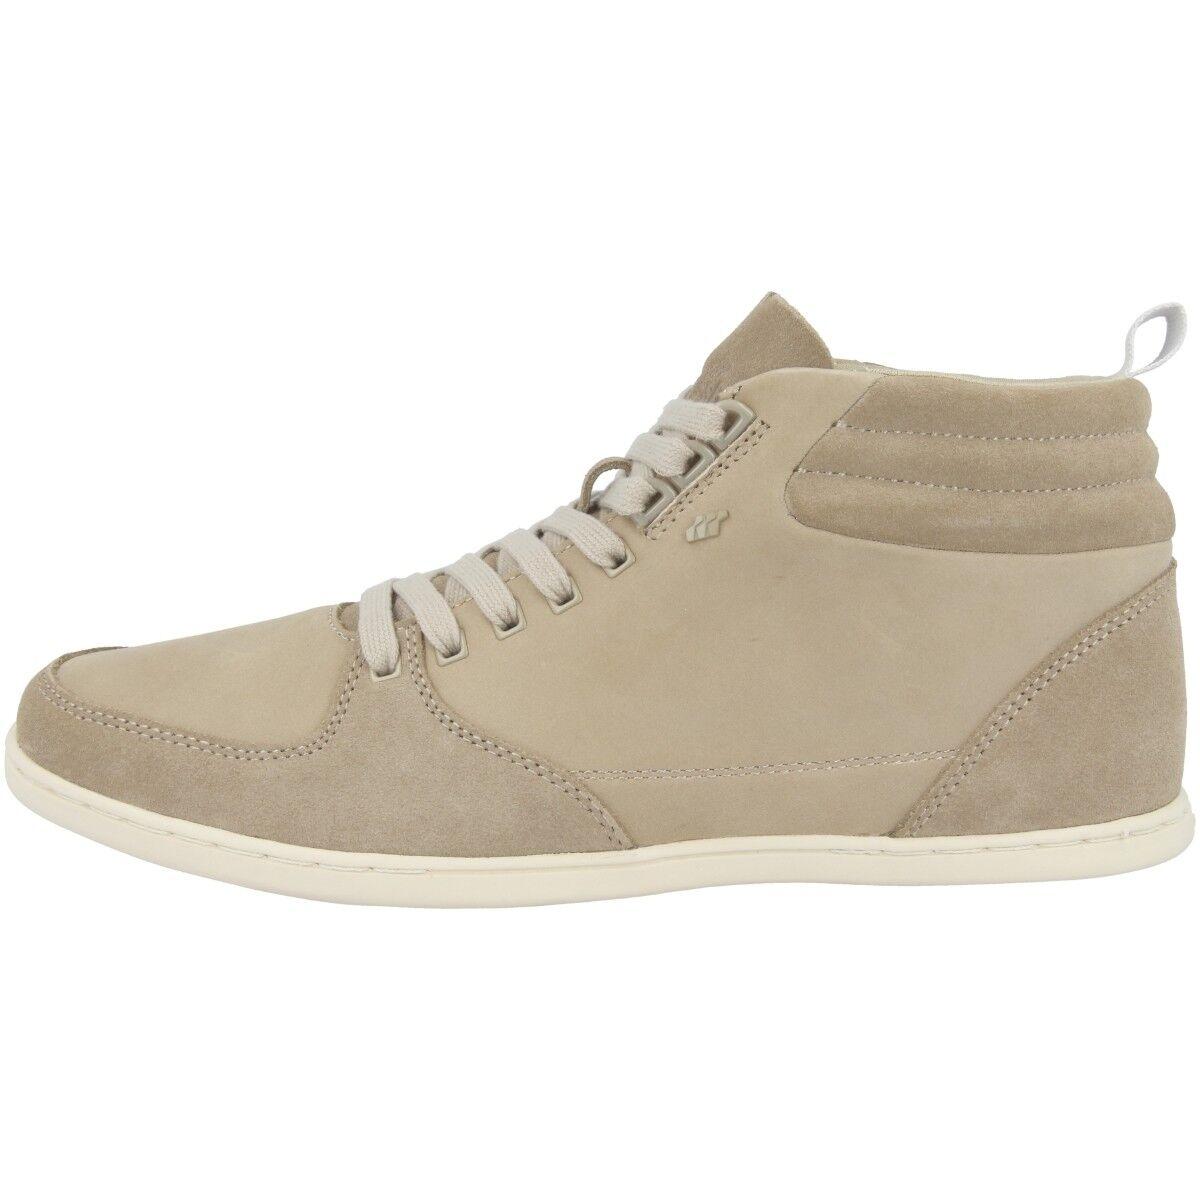 Boxfresh Eplett Sh Chaussures en Cuir Mid Cut paniers Loisirs Vison D'Argent